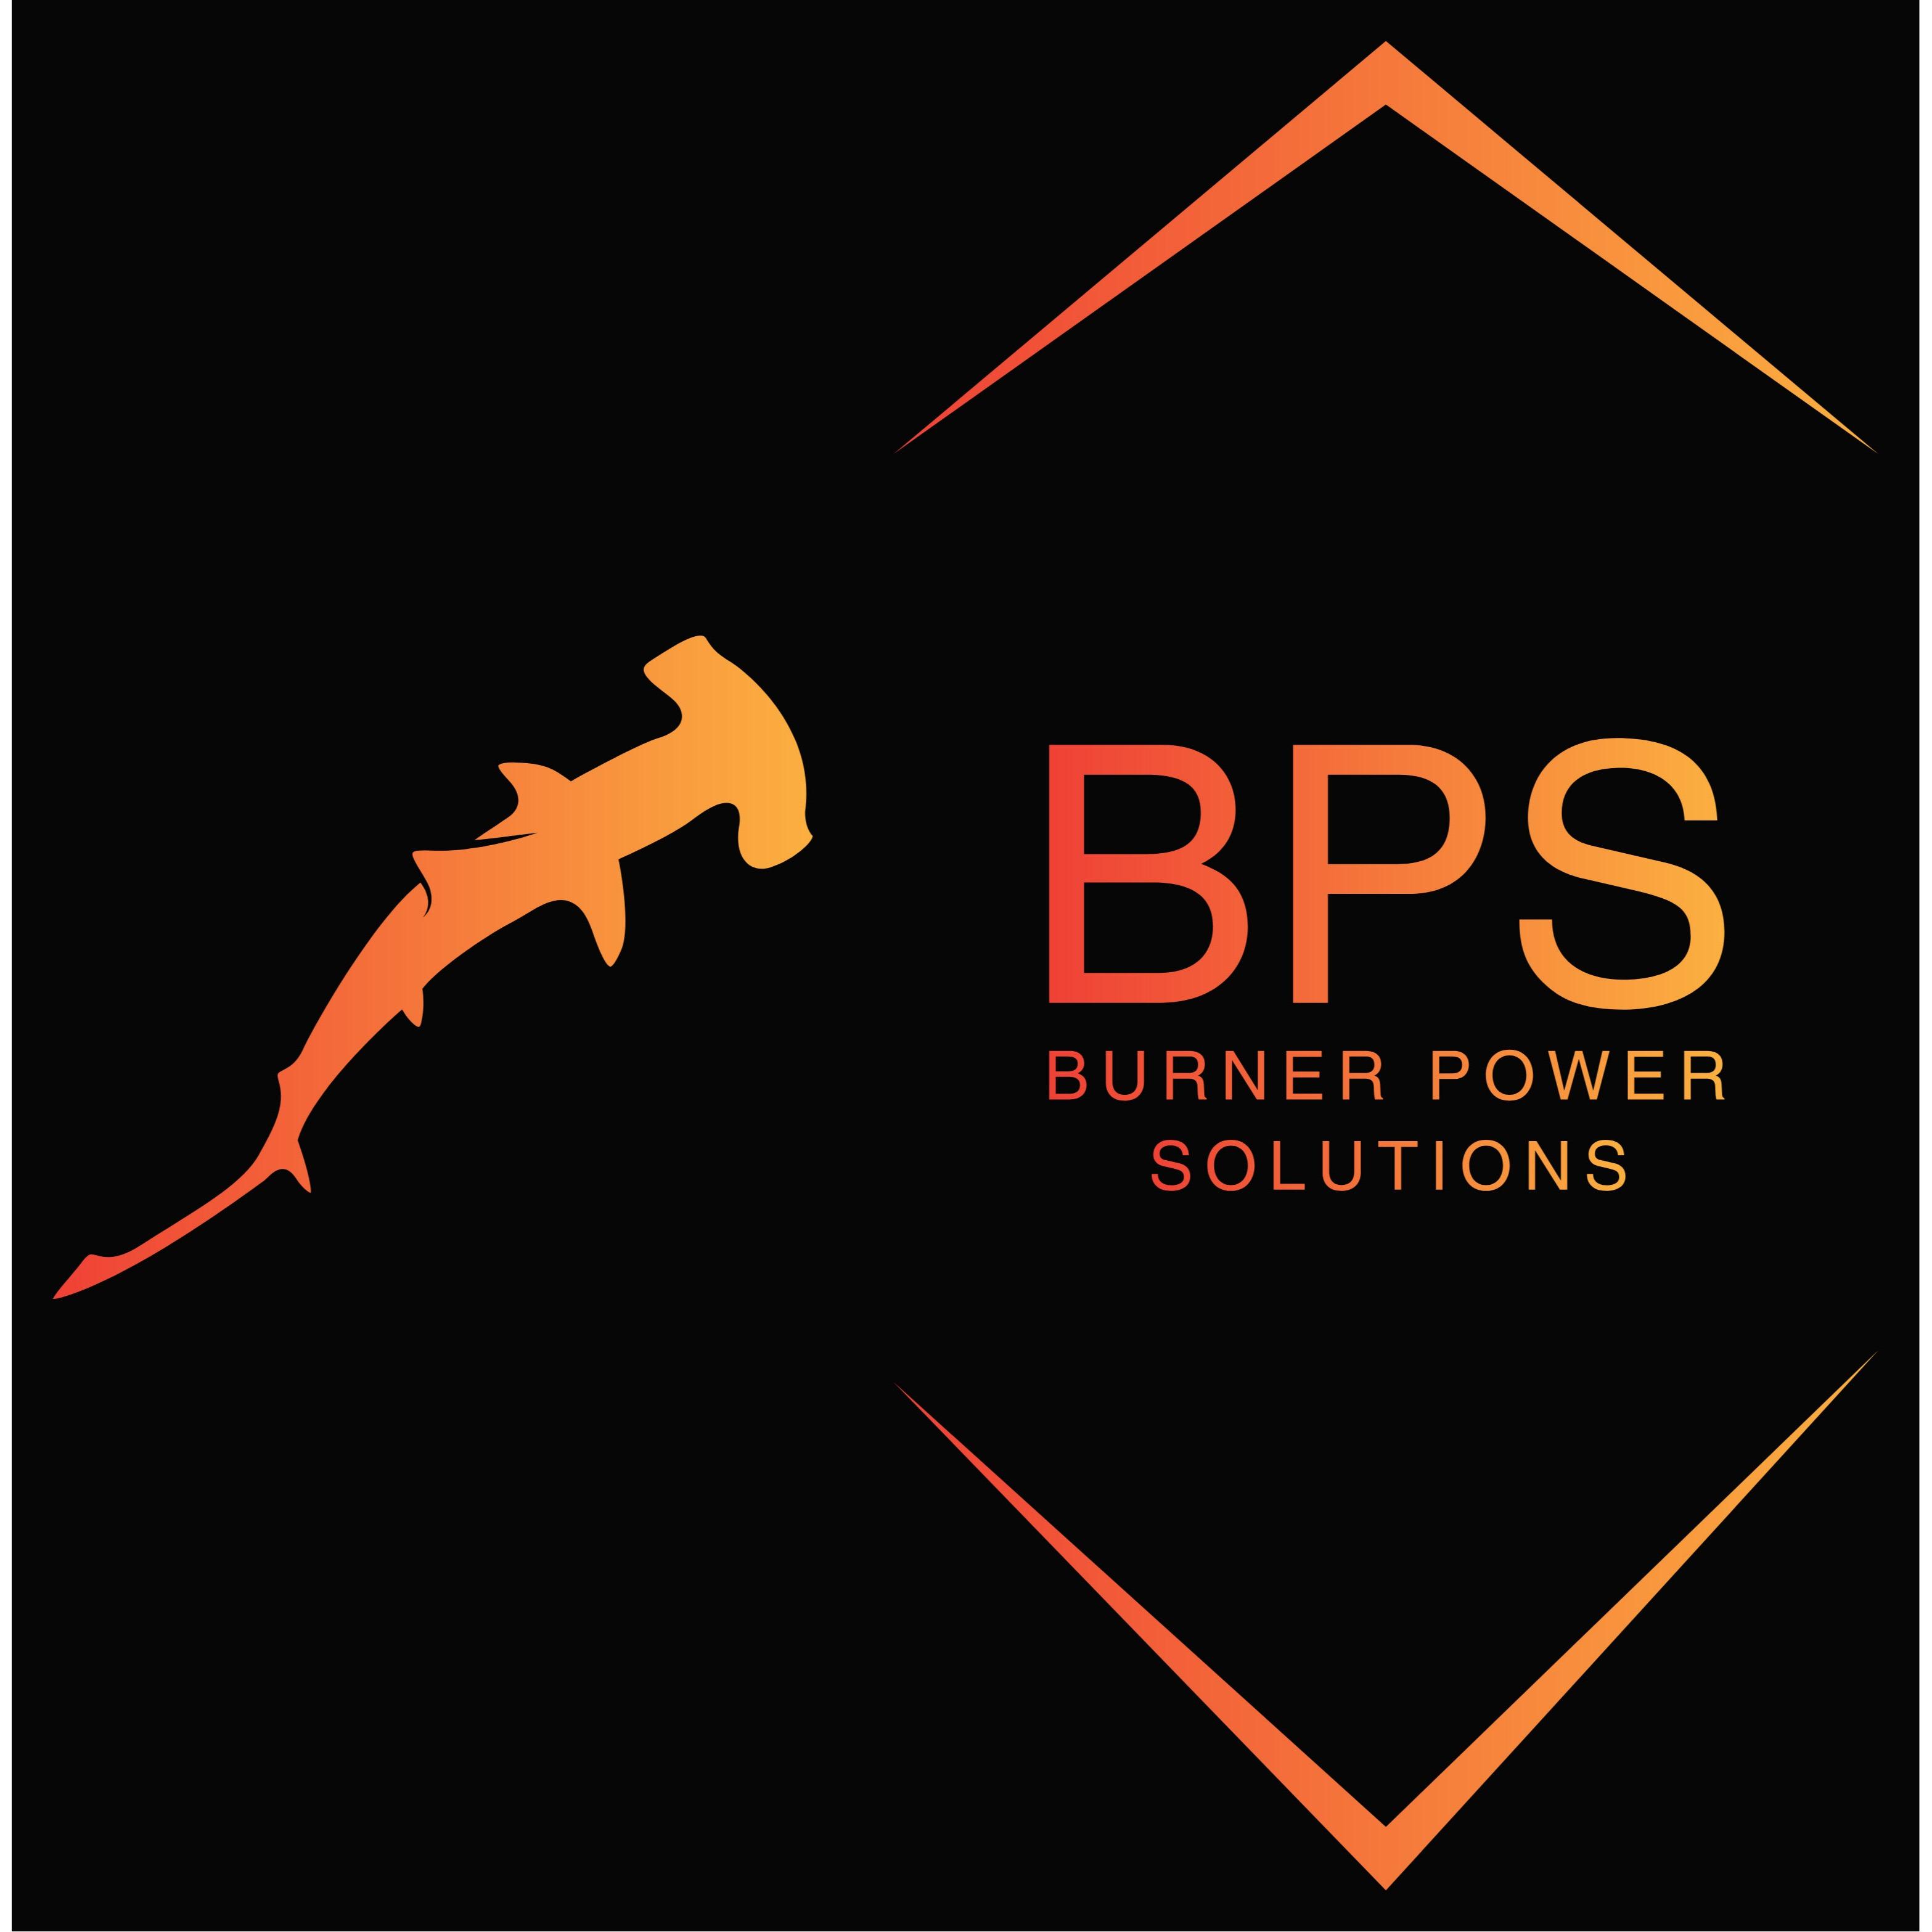 Burner Power Solutions